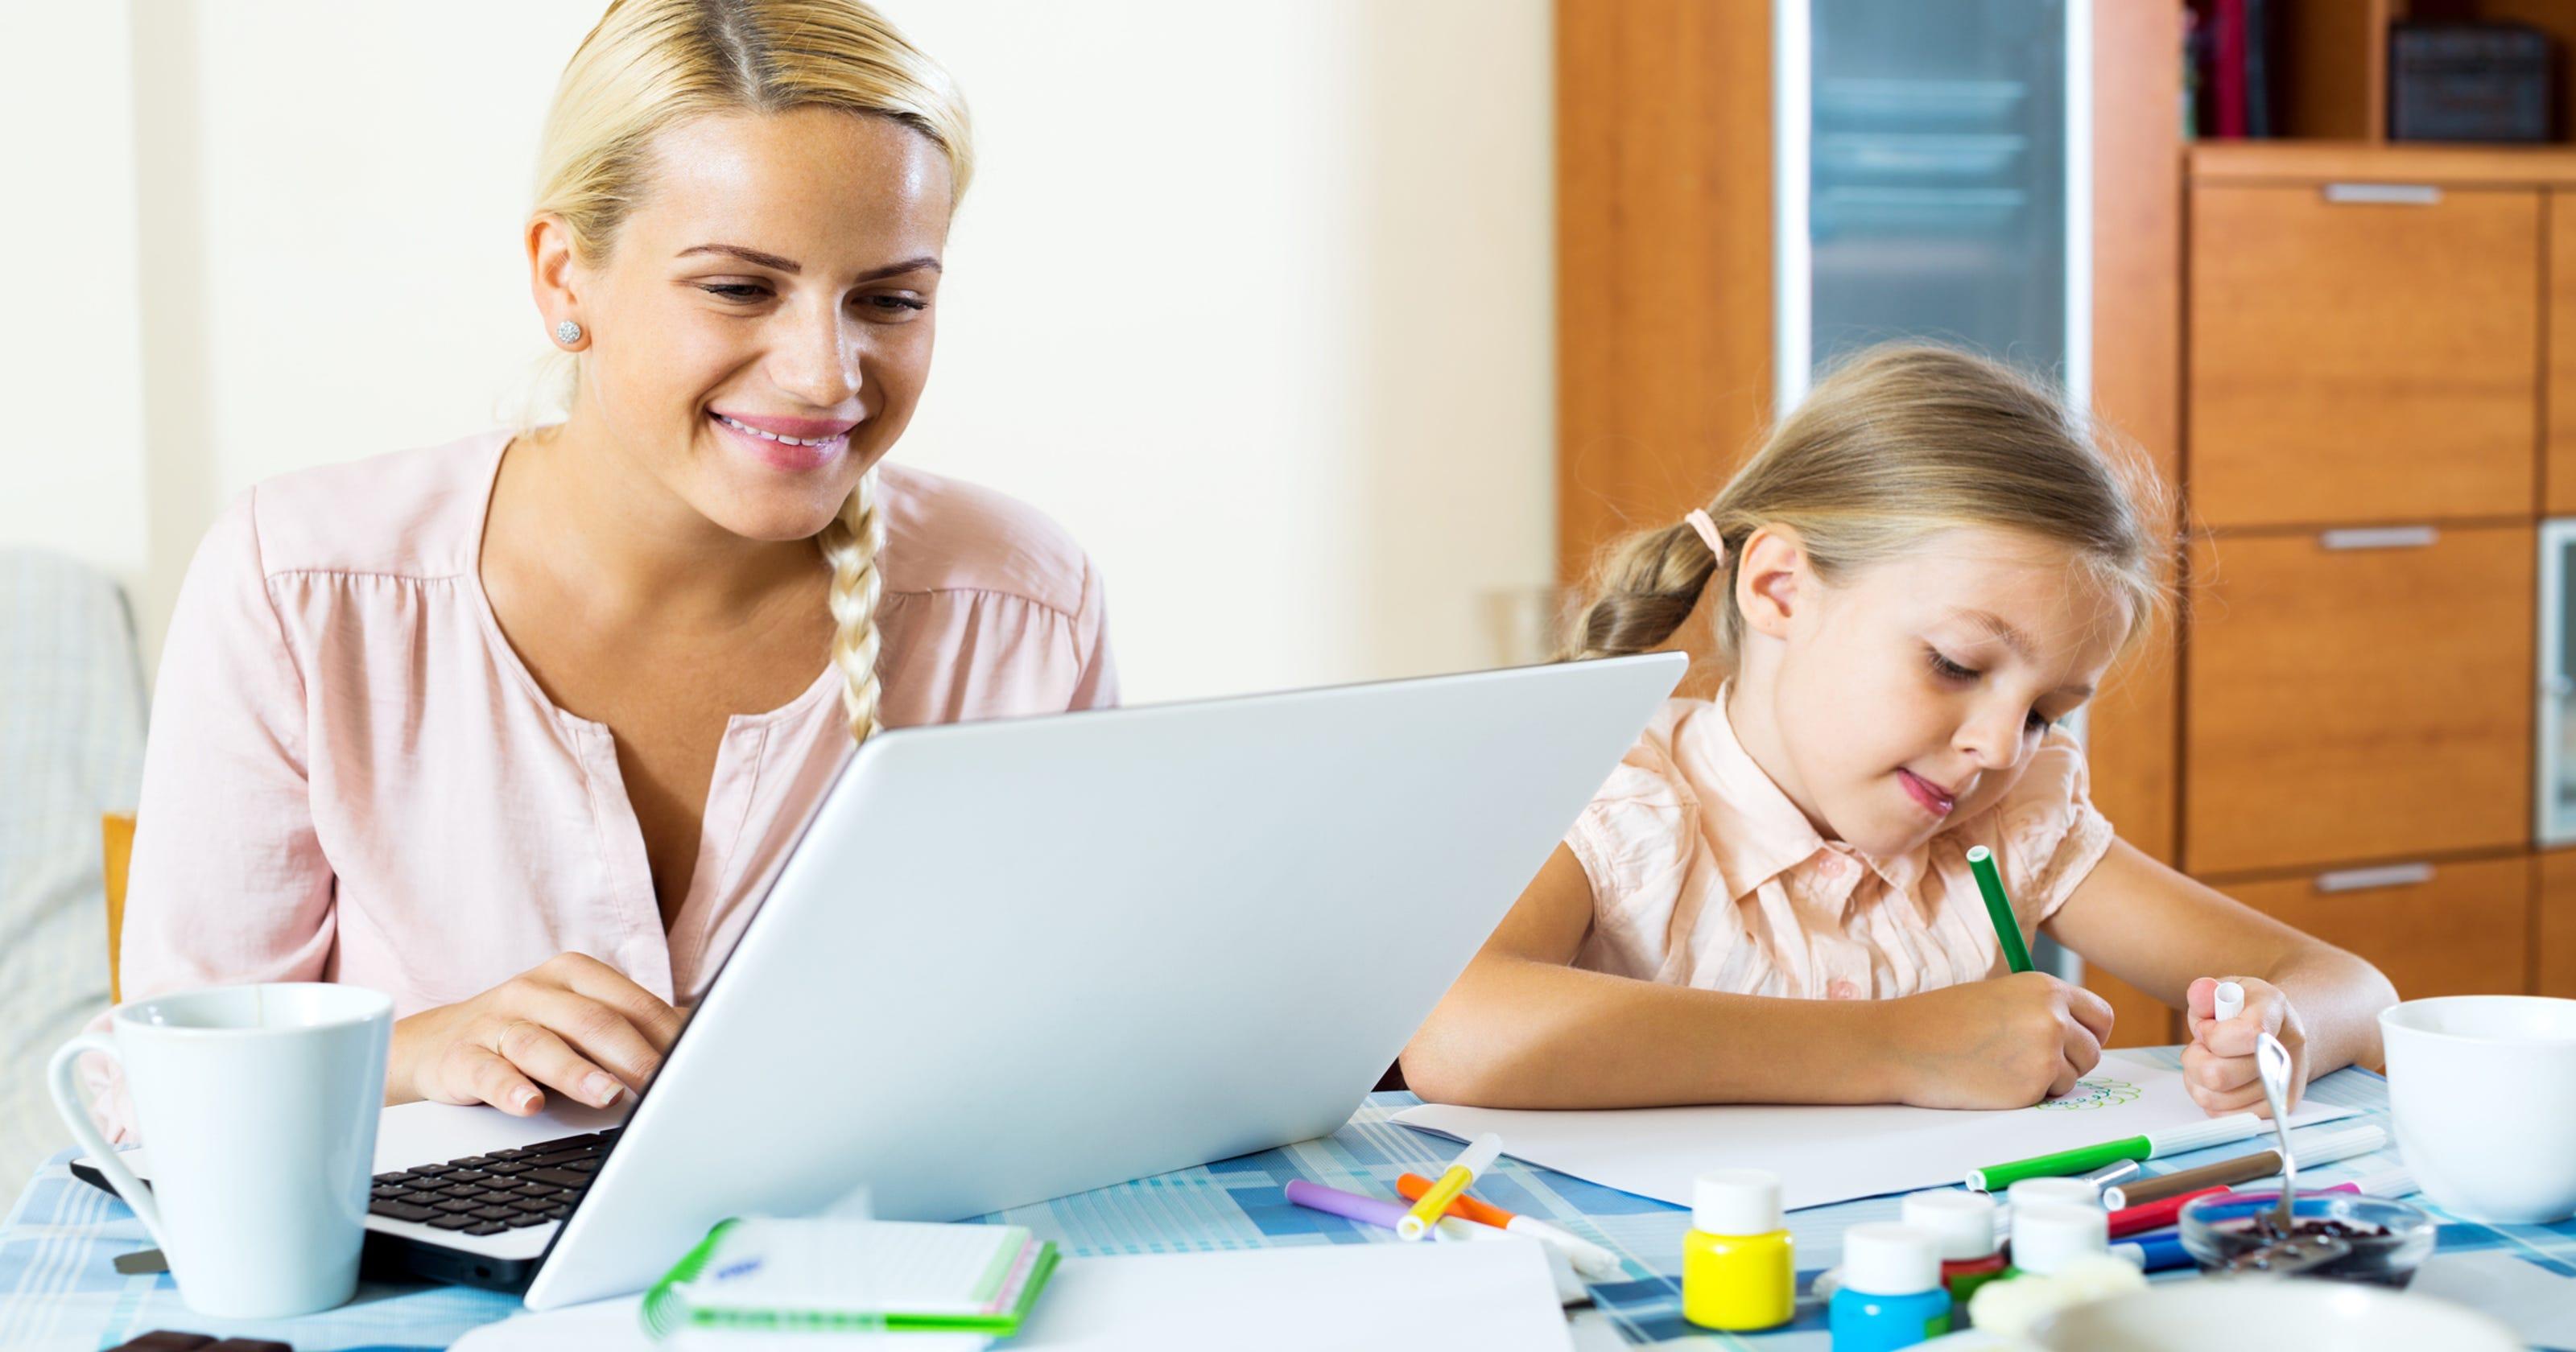 mompreneurs best small businesses for moms